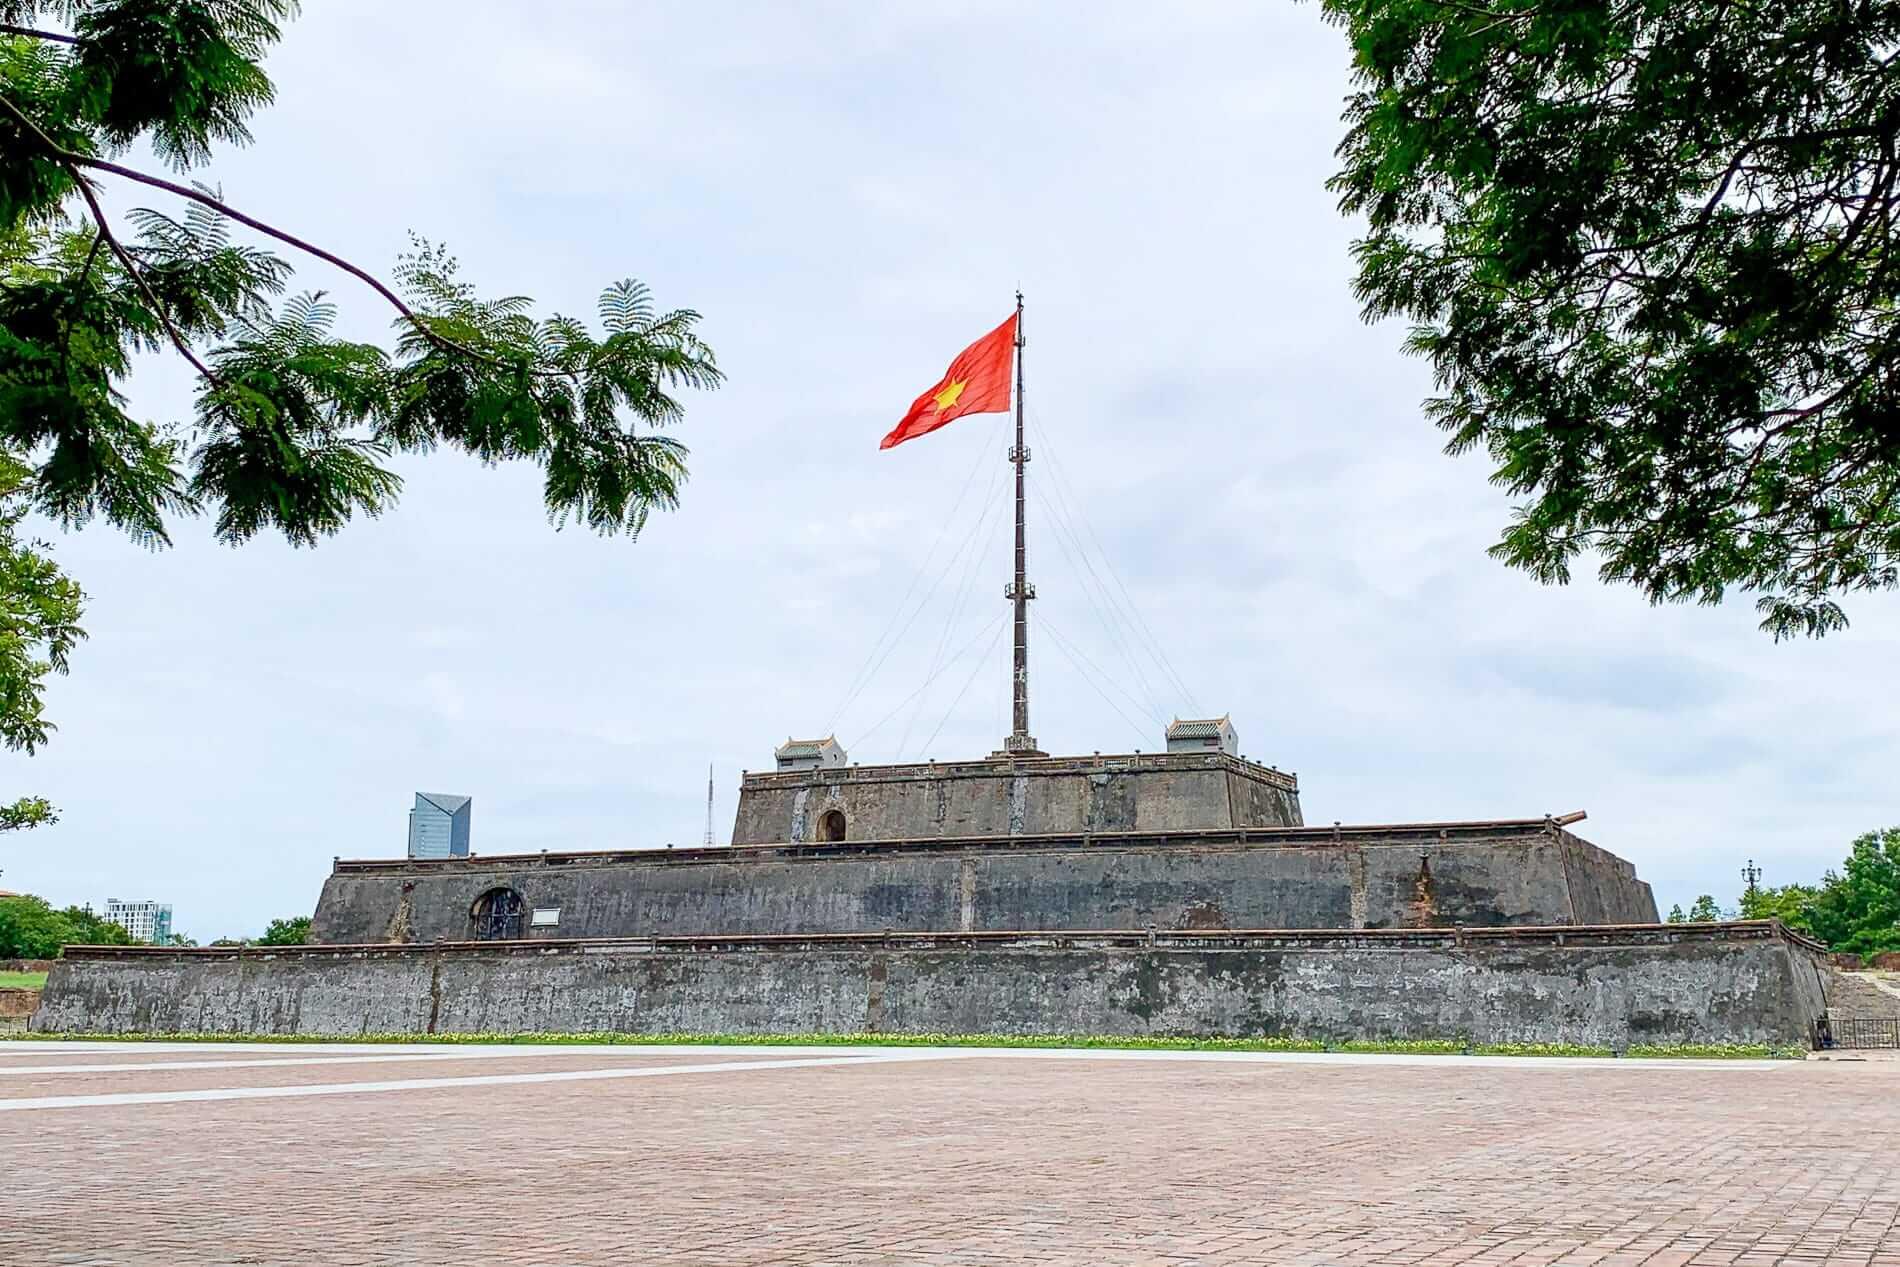 A Vietnamese flag flies over Hue Citadel